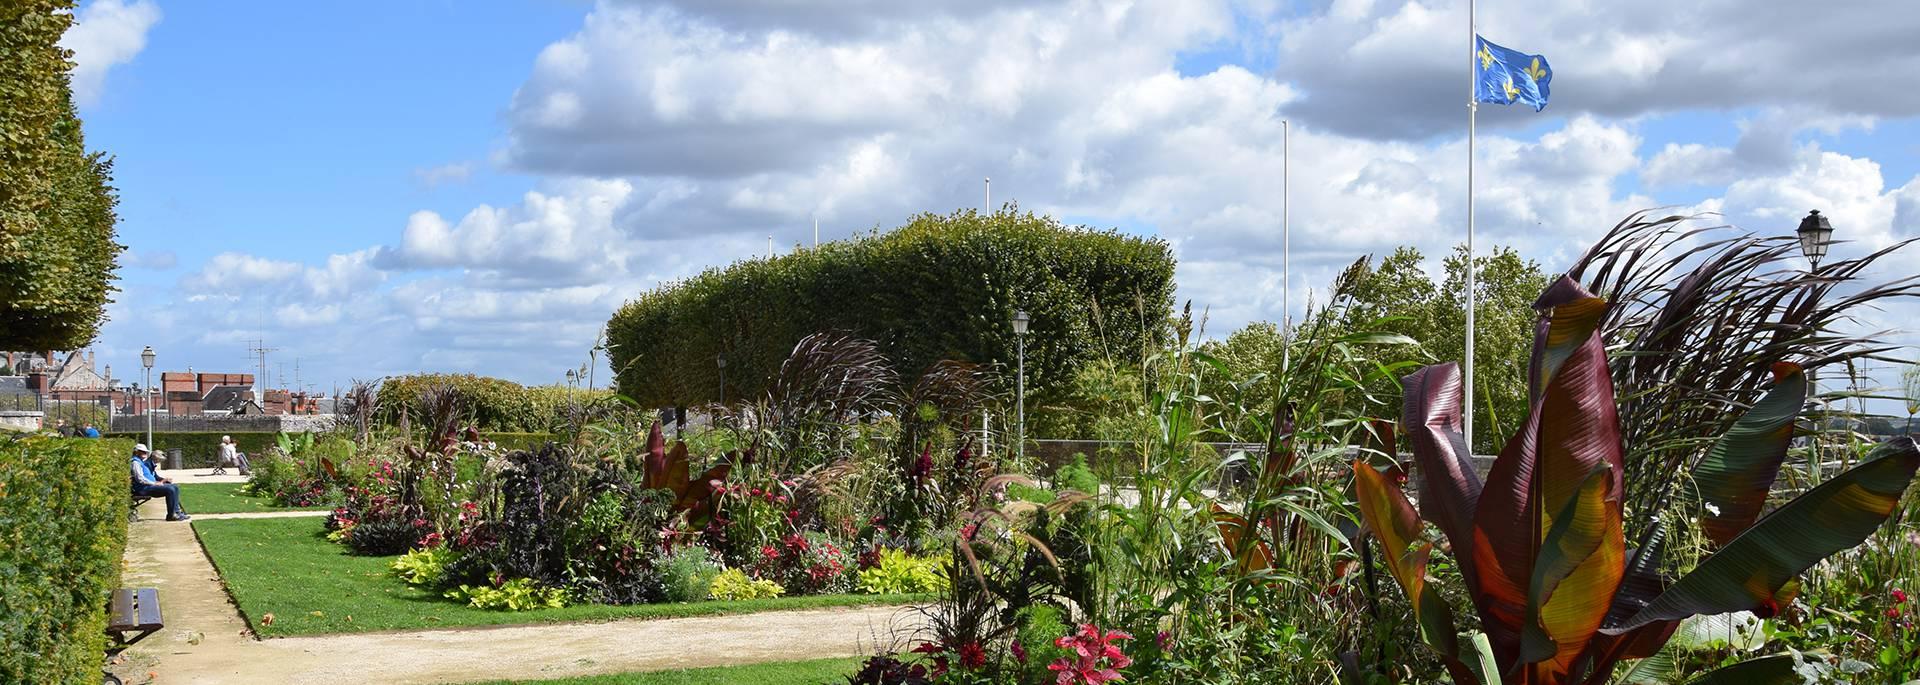 Die Jardins Saint Sauveur in Blois im Sommer